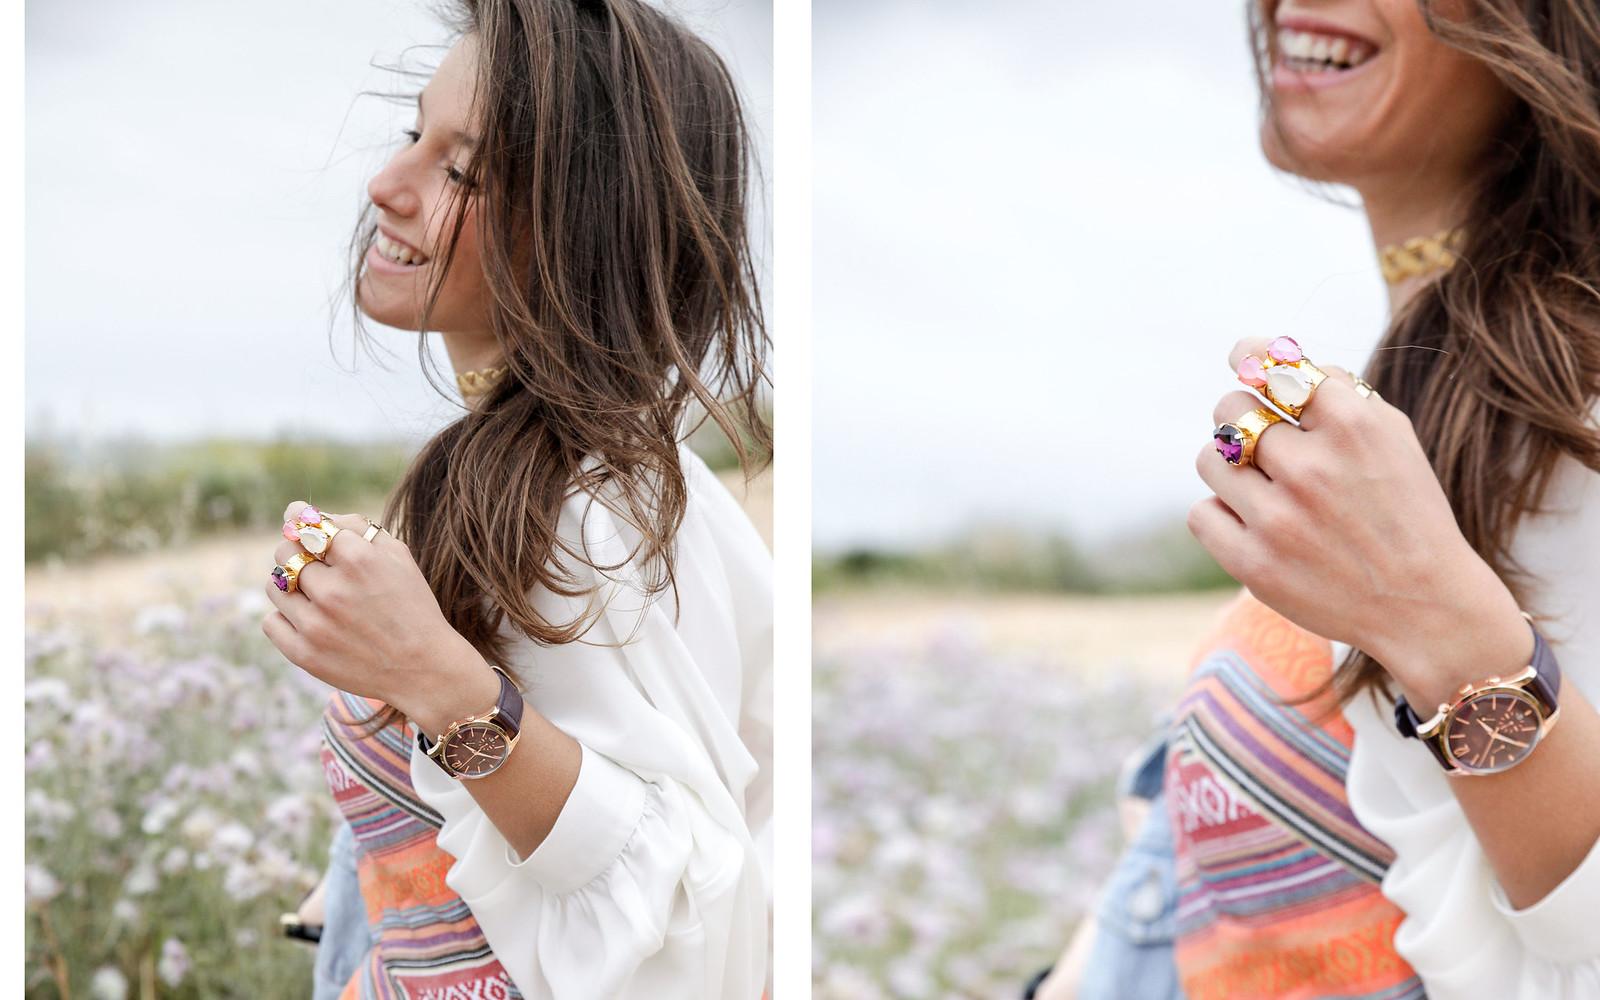 04_corset_etnico_danity_paris_theguestgirl_influencer_barcelona_laura_santolaria